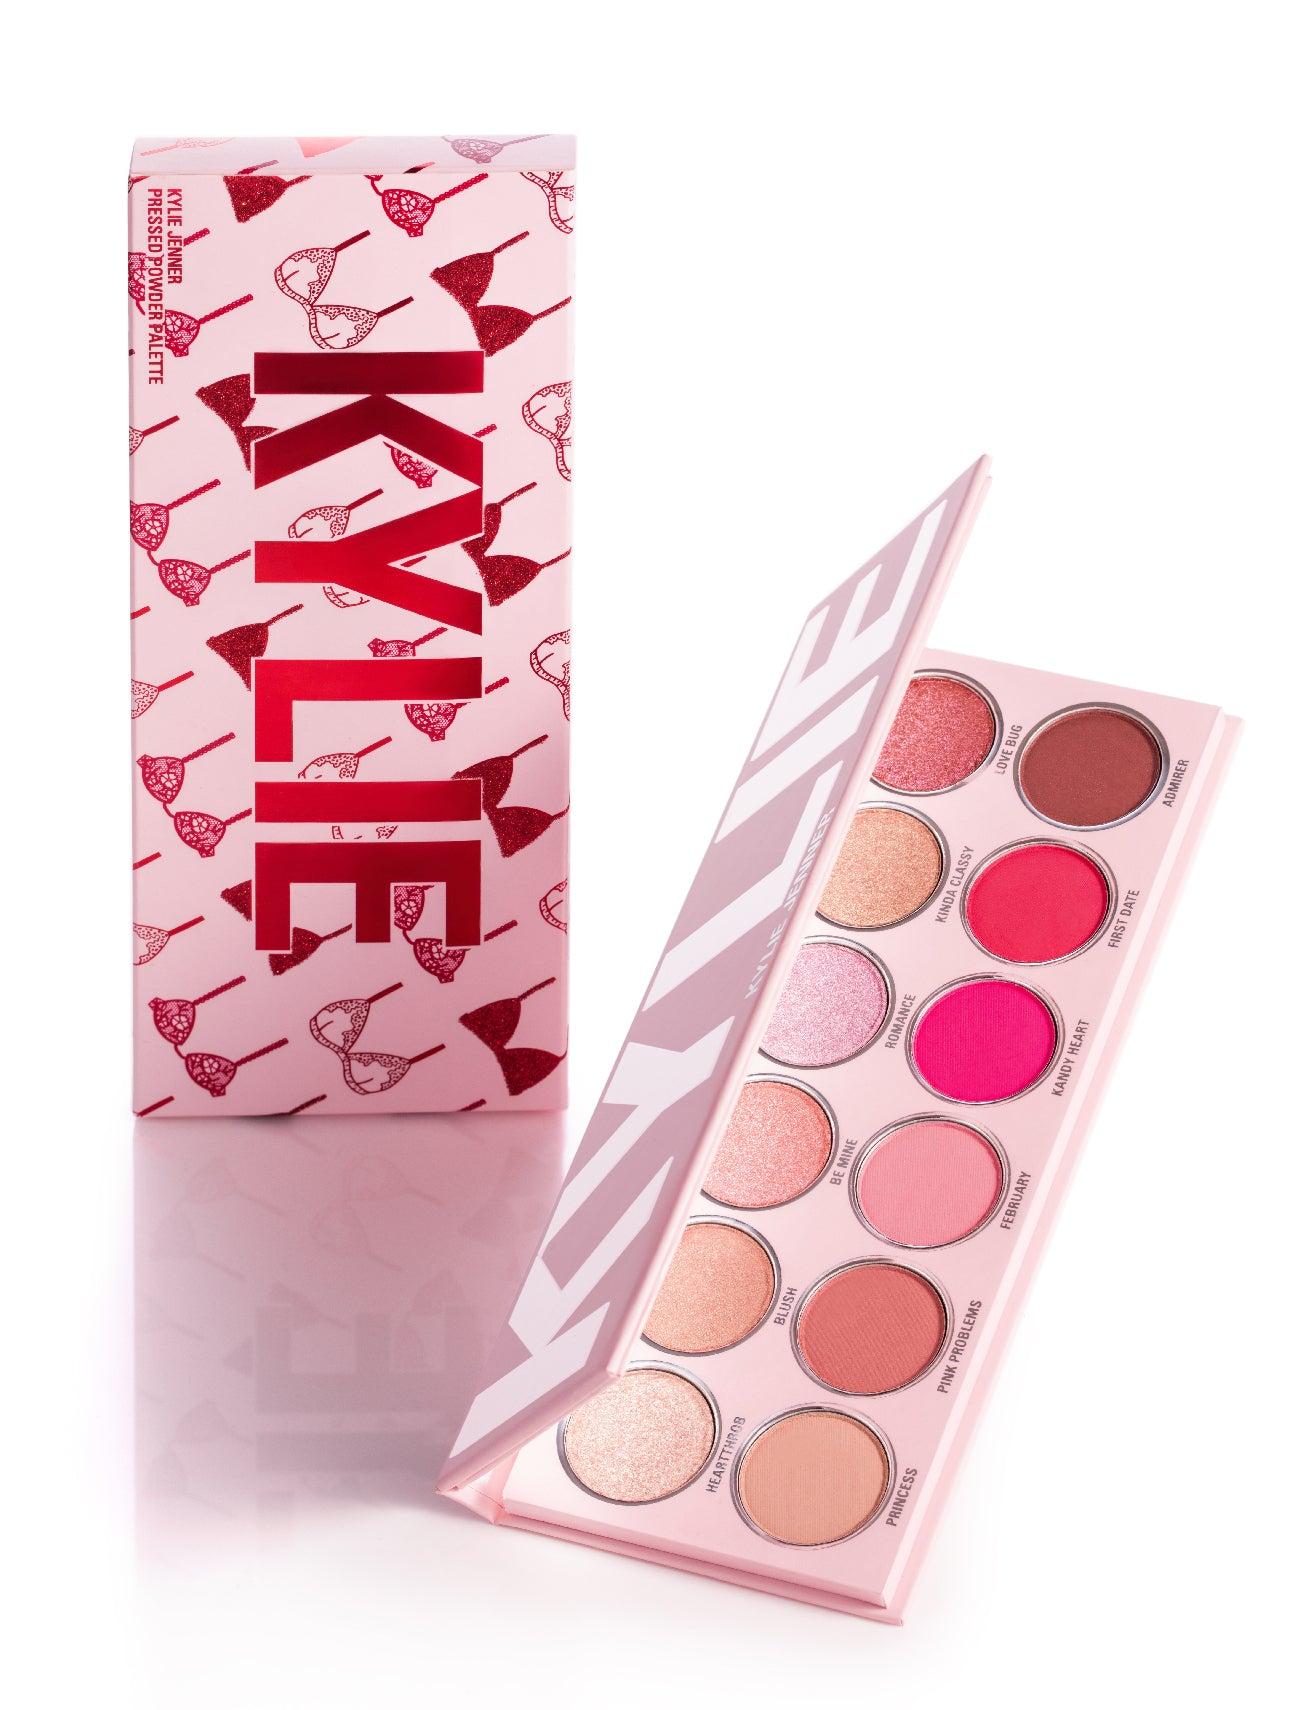 Kylie Cosmetics - The Valentine Palette